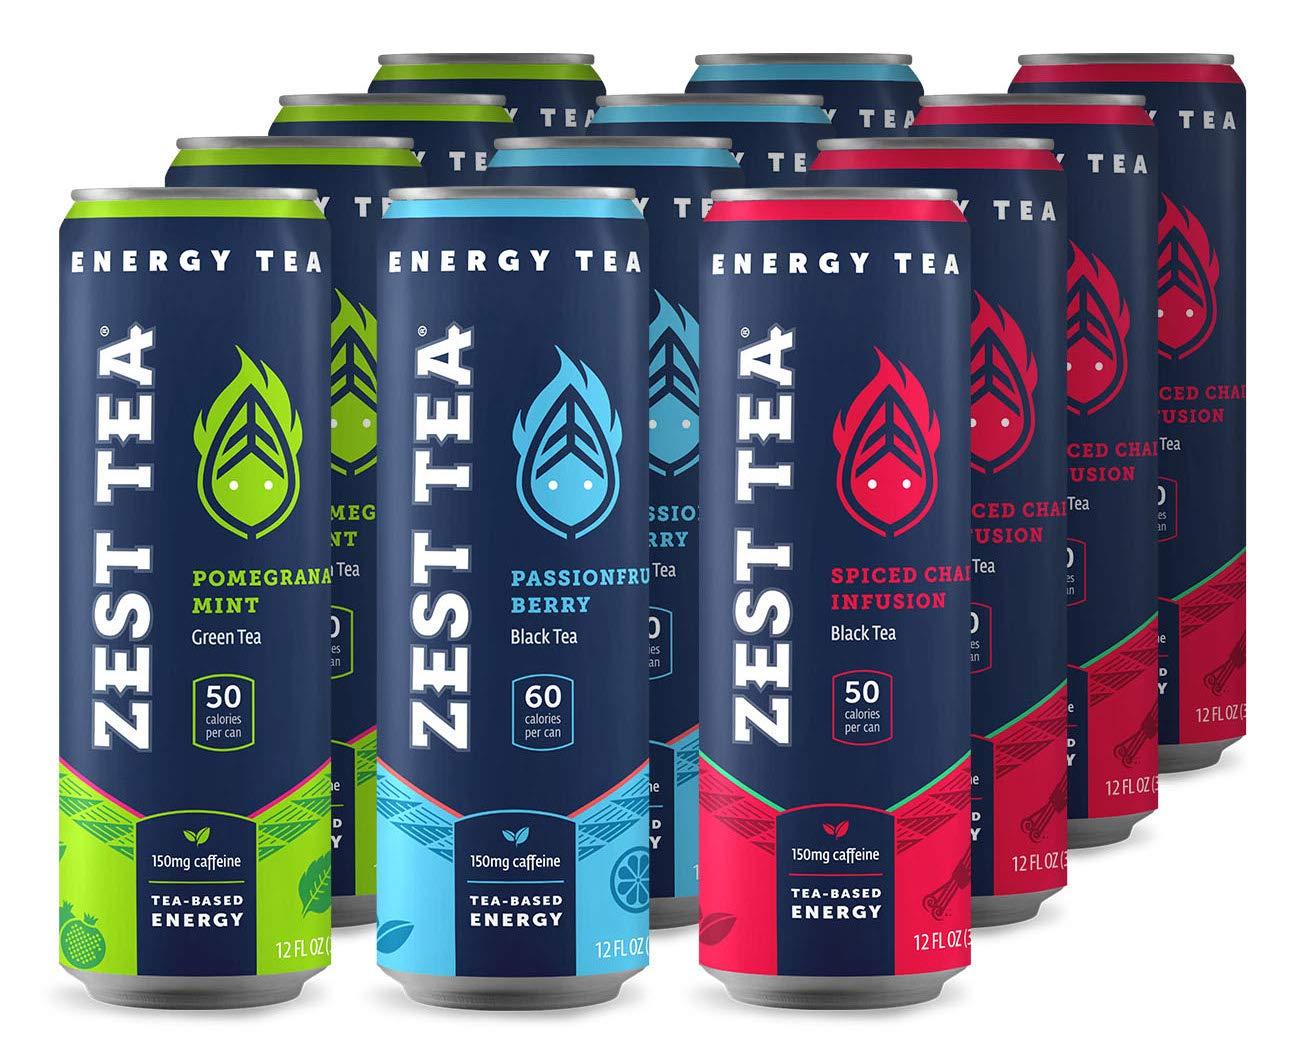 Zest Tea Energy Iced Tea, High Caffeine Low Sugar Blend Natural & Healthy Black Coffee Substitute, 150 mg Caffeine per 12 Oz Can, Trifecta (Variety Pack), 12 Pack